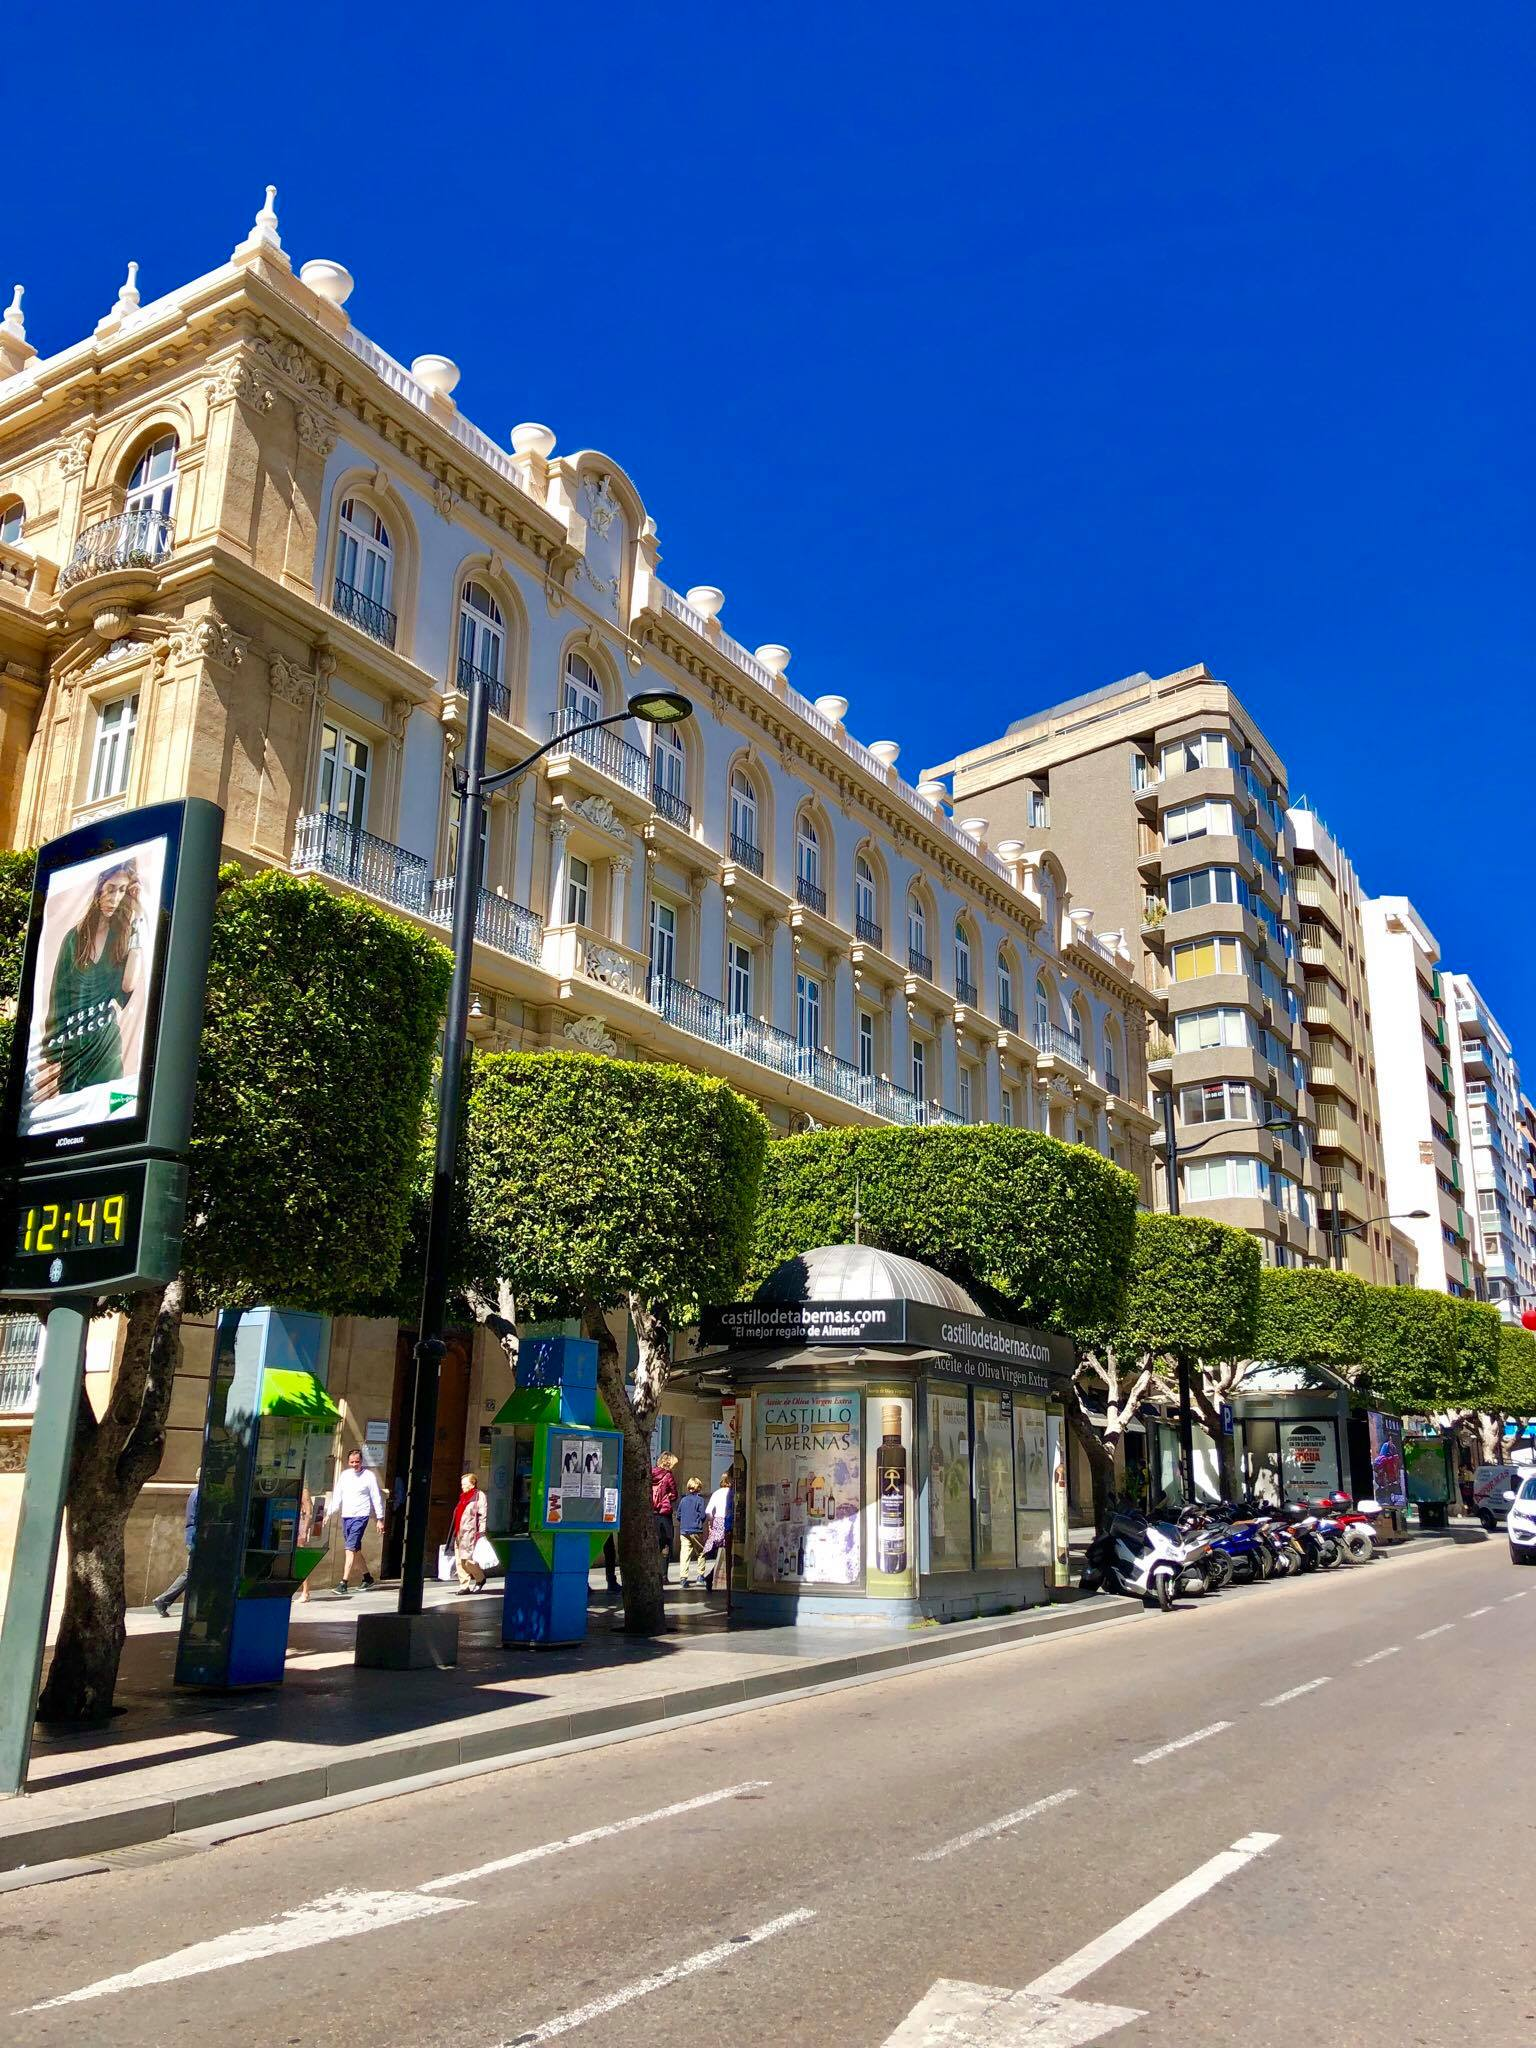 Kach Solo Travels in 2019 Thanks to Cámara de Comercio de Almería2.jpg